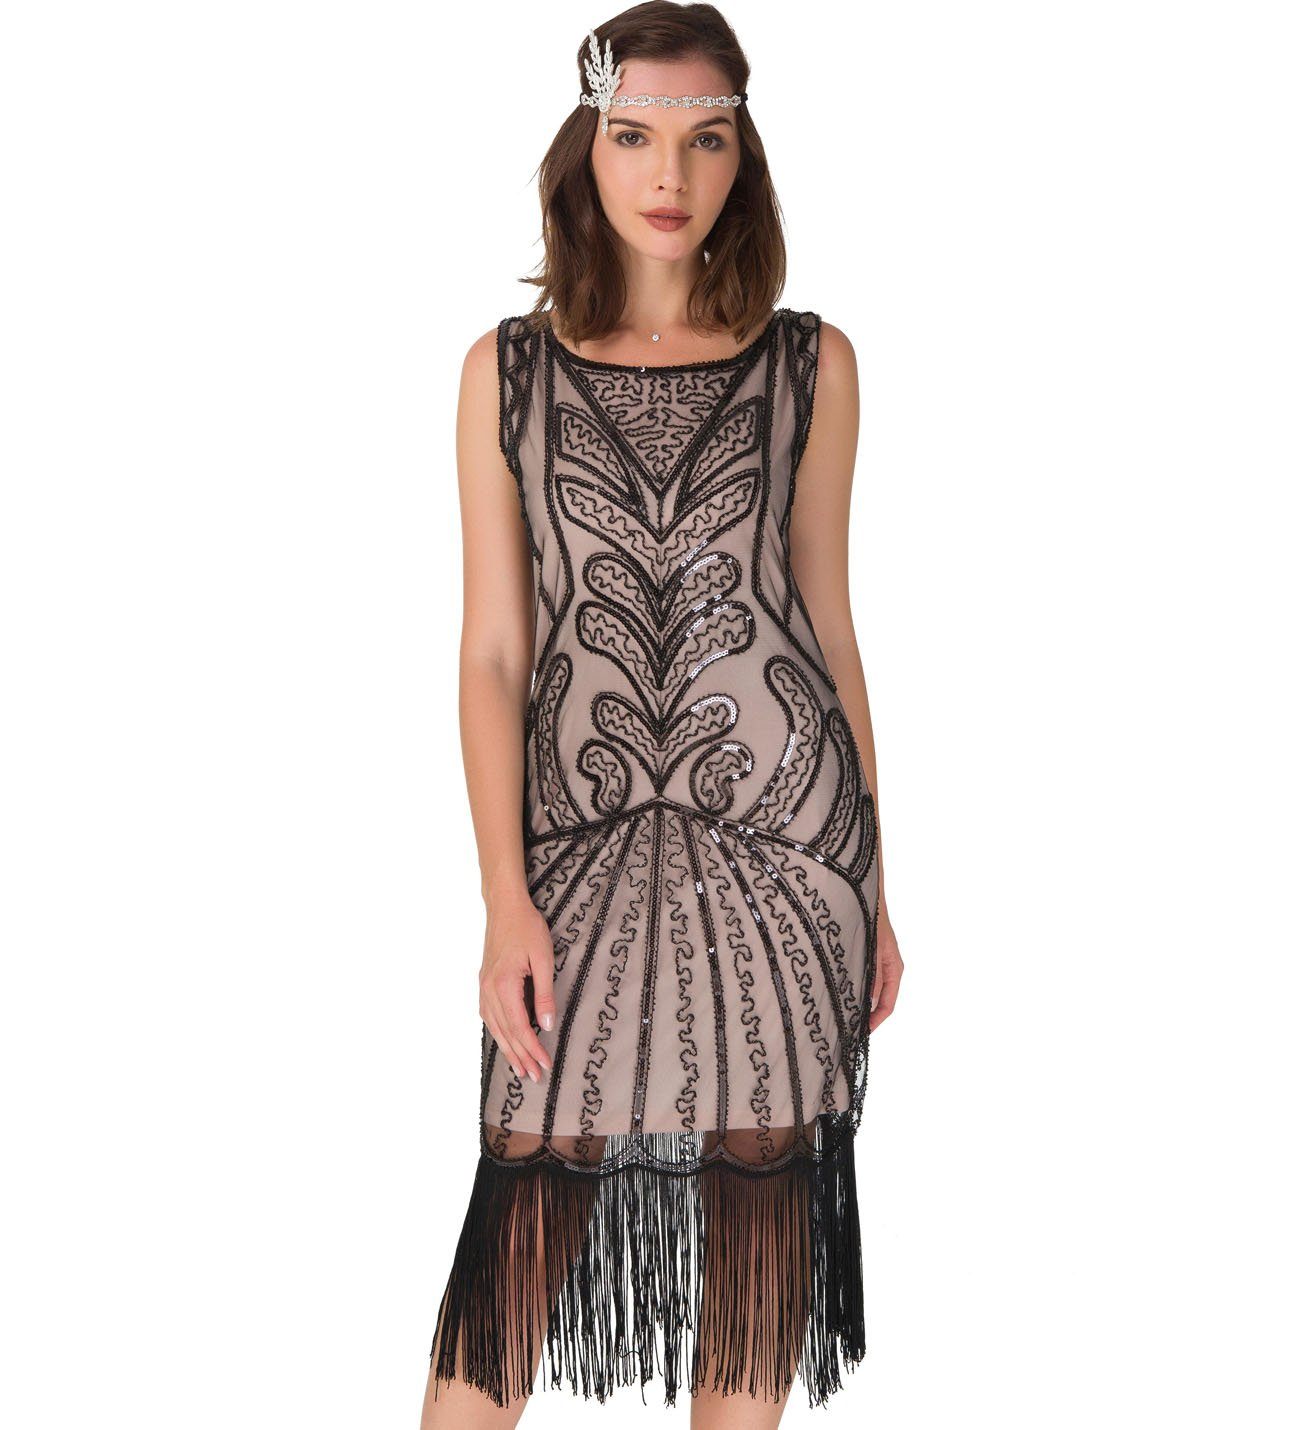 Uniq Sense Women's 1920s Flapper Dress - Fringe Vintage Great Gatsby Party Dress